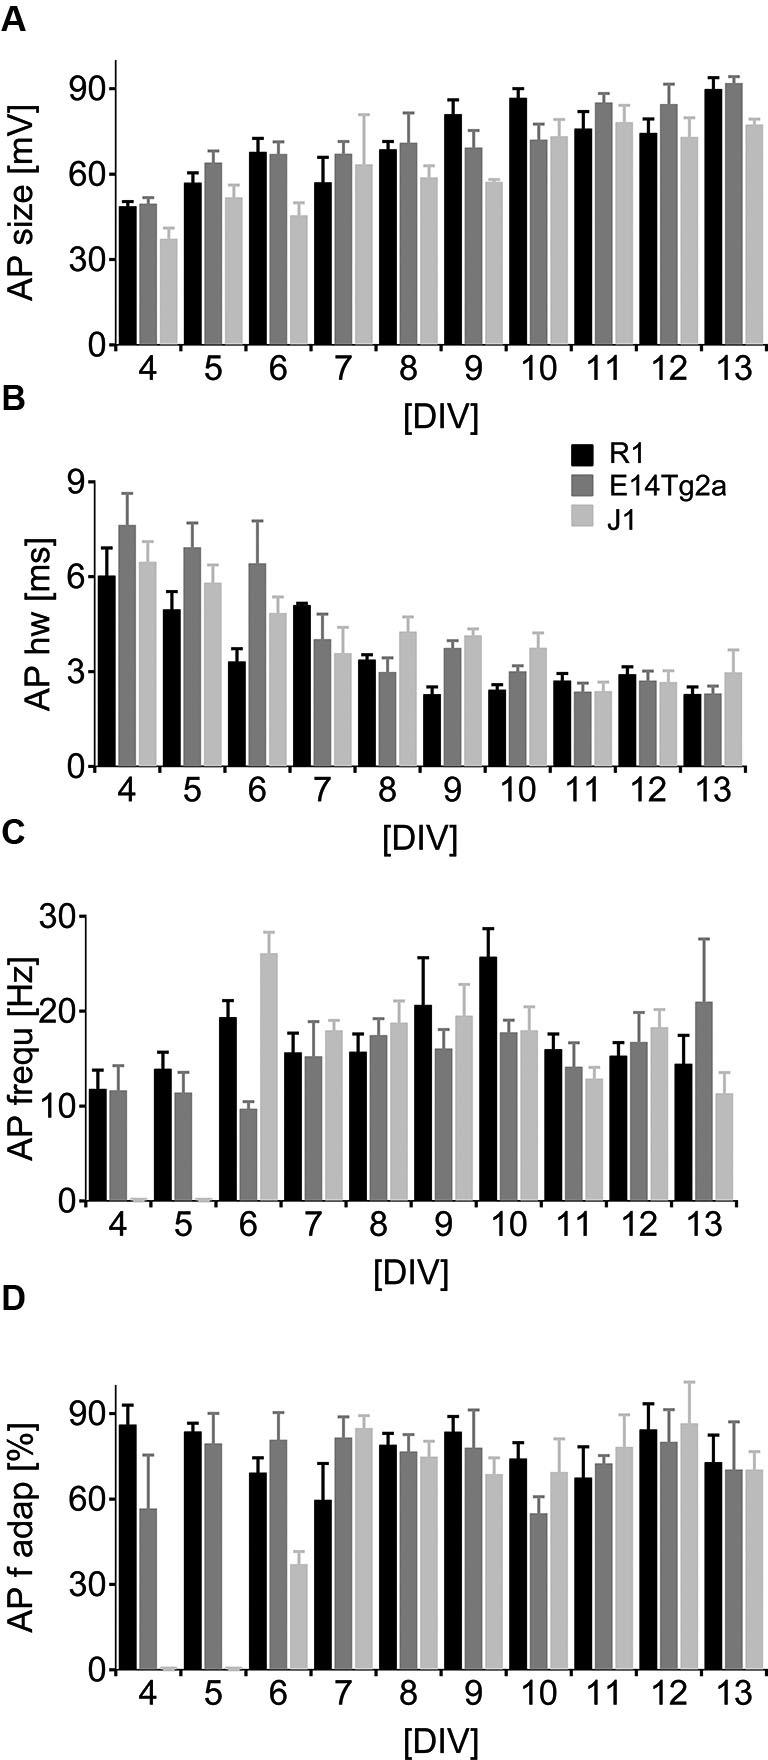 Neuronal spiking patterns as a function of developmental